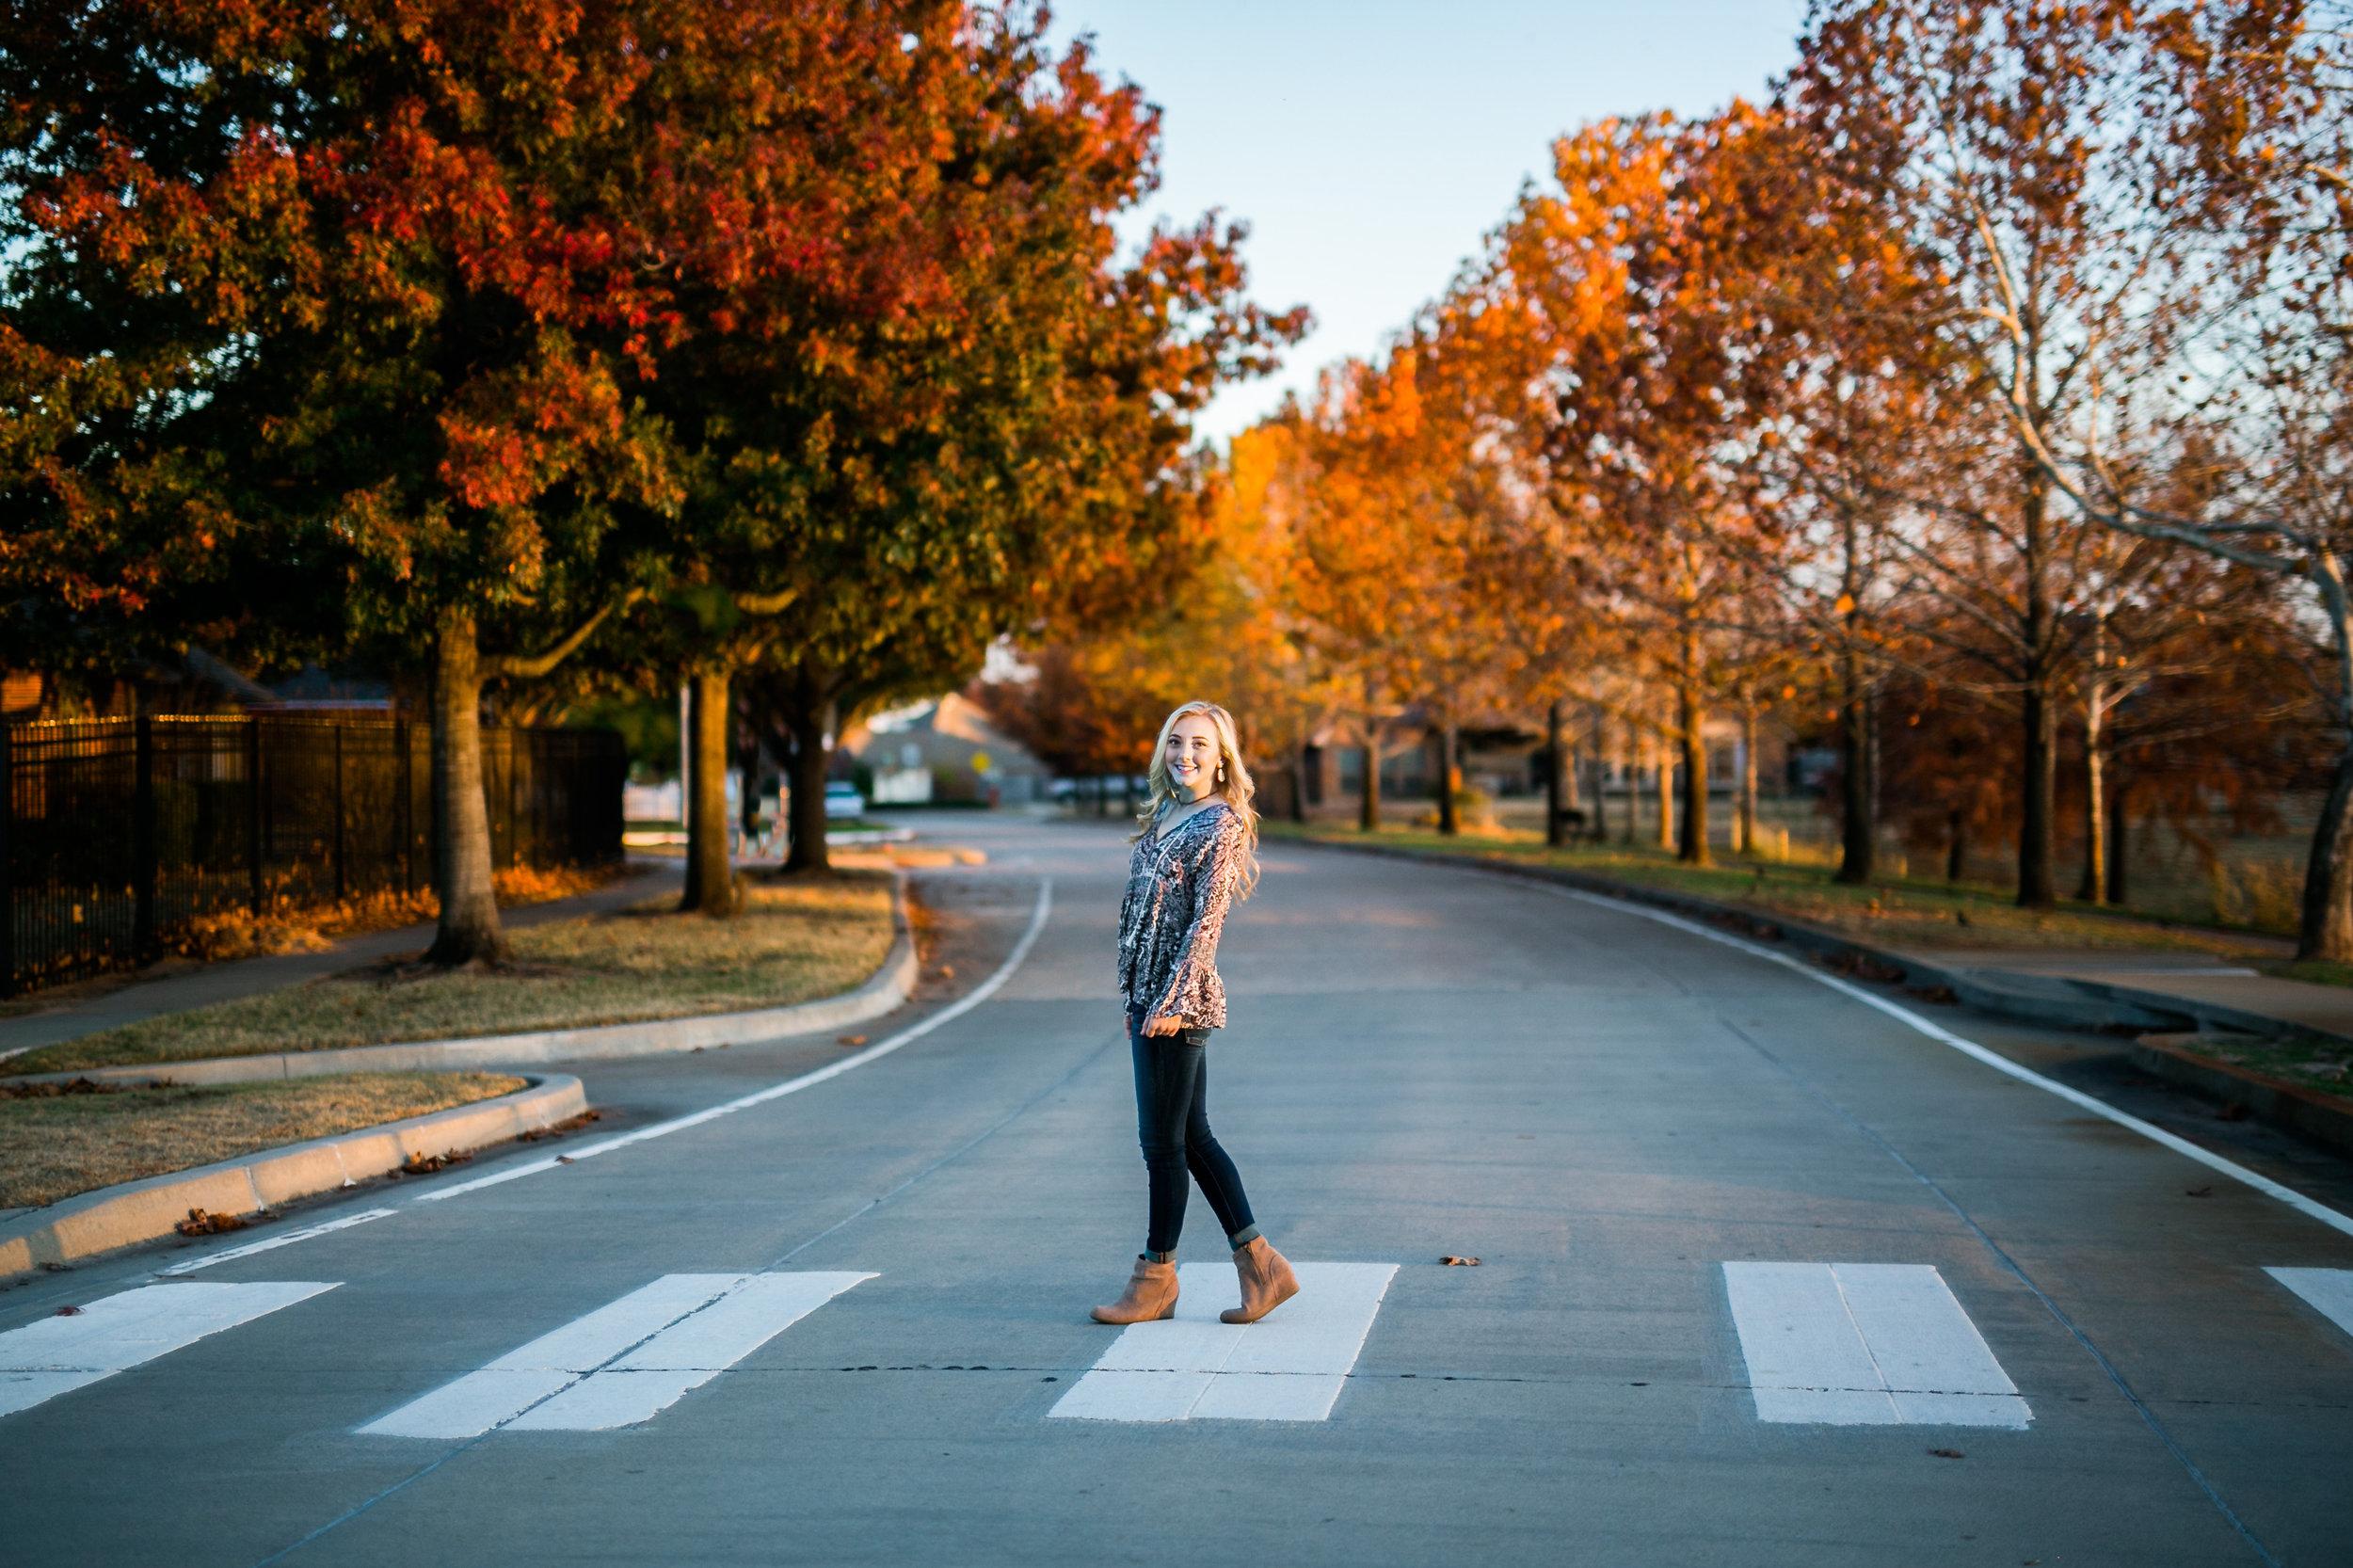 oklahoma senior photographer norman washington high school crosswalk fall foliage leaves